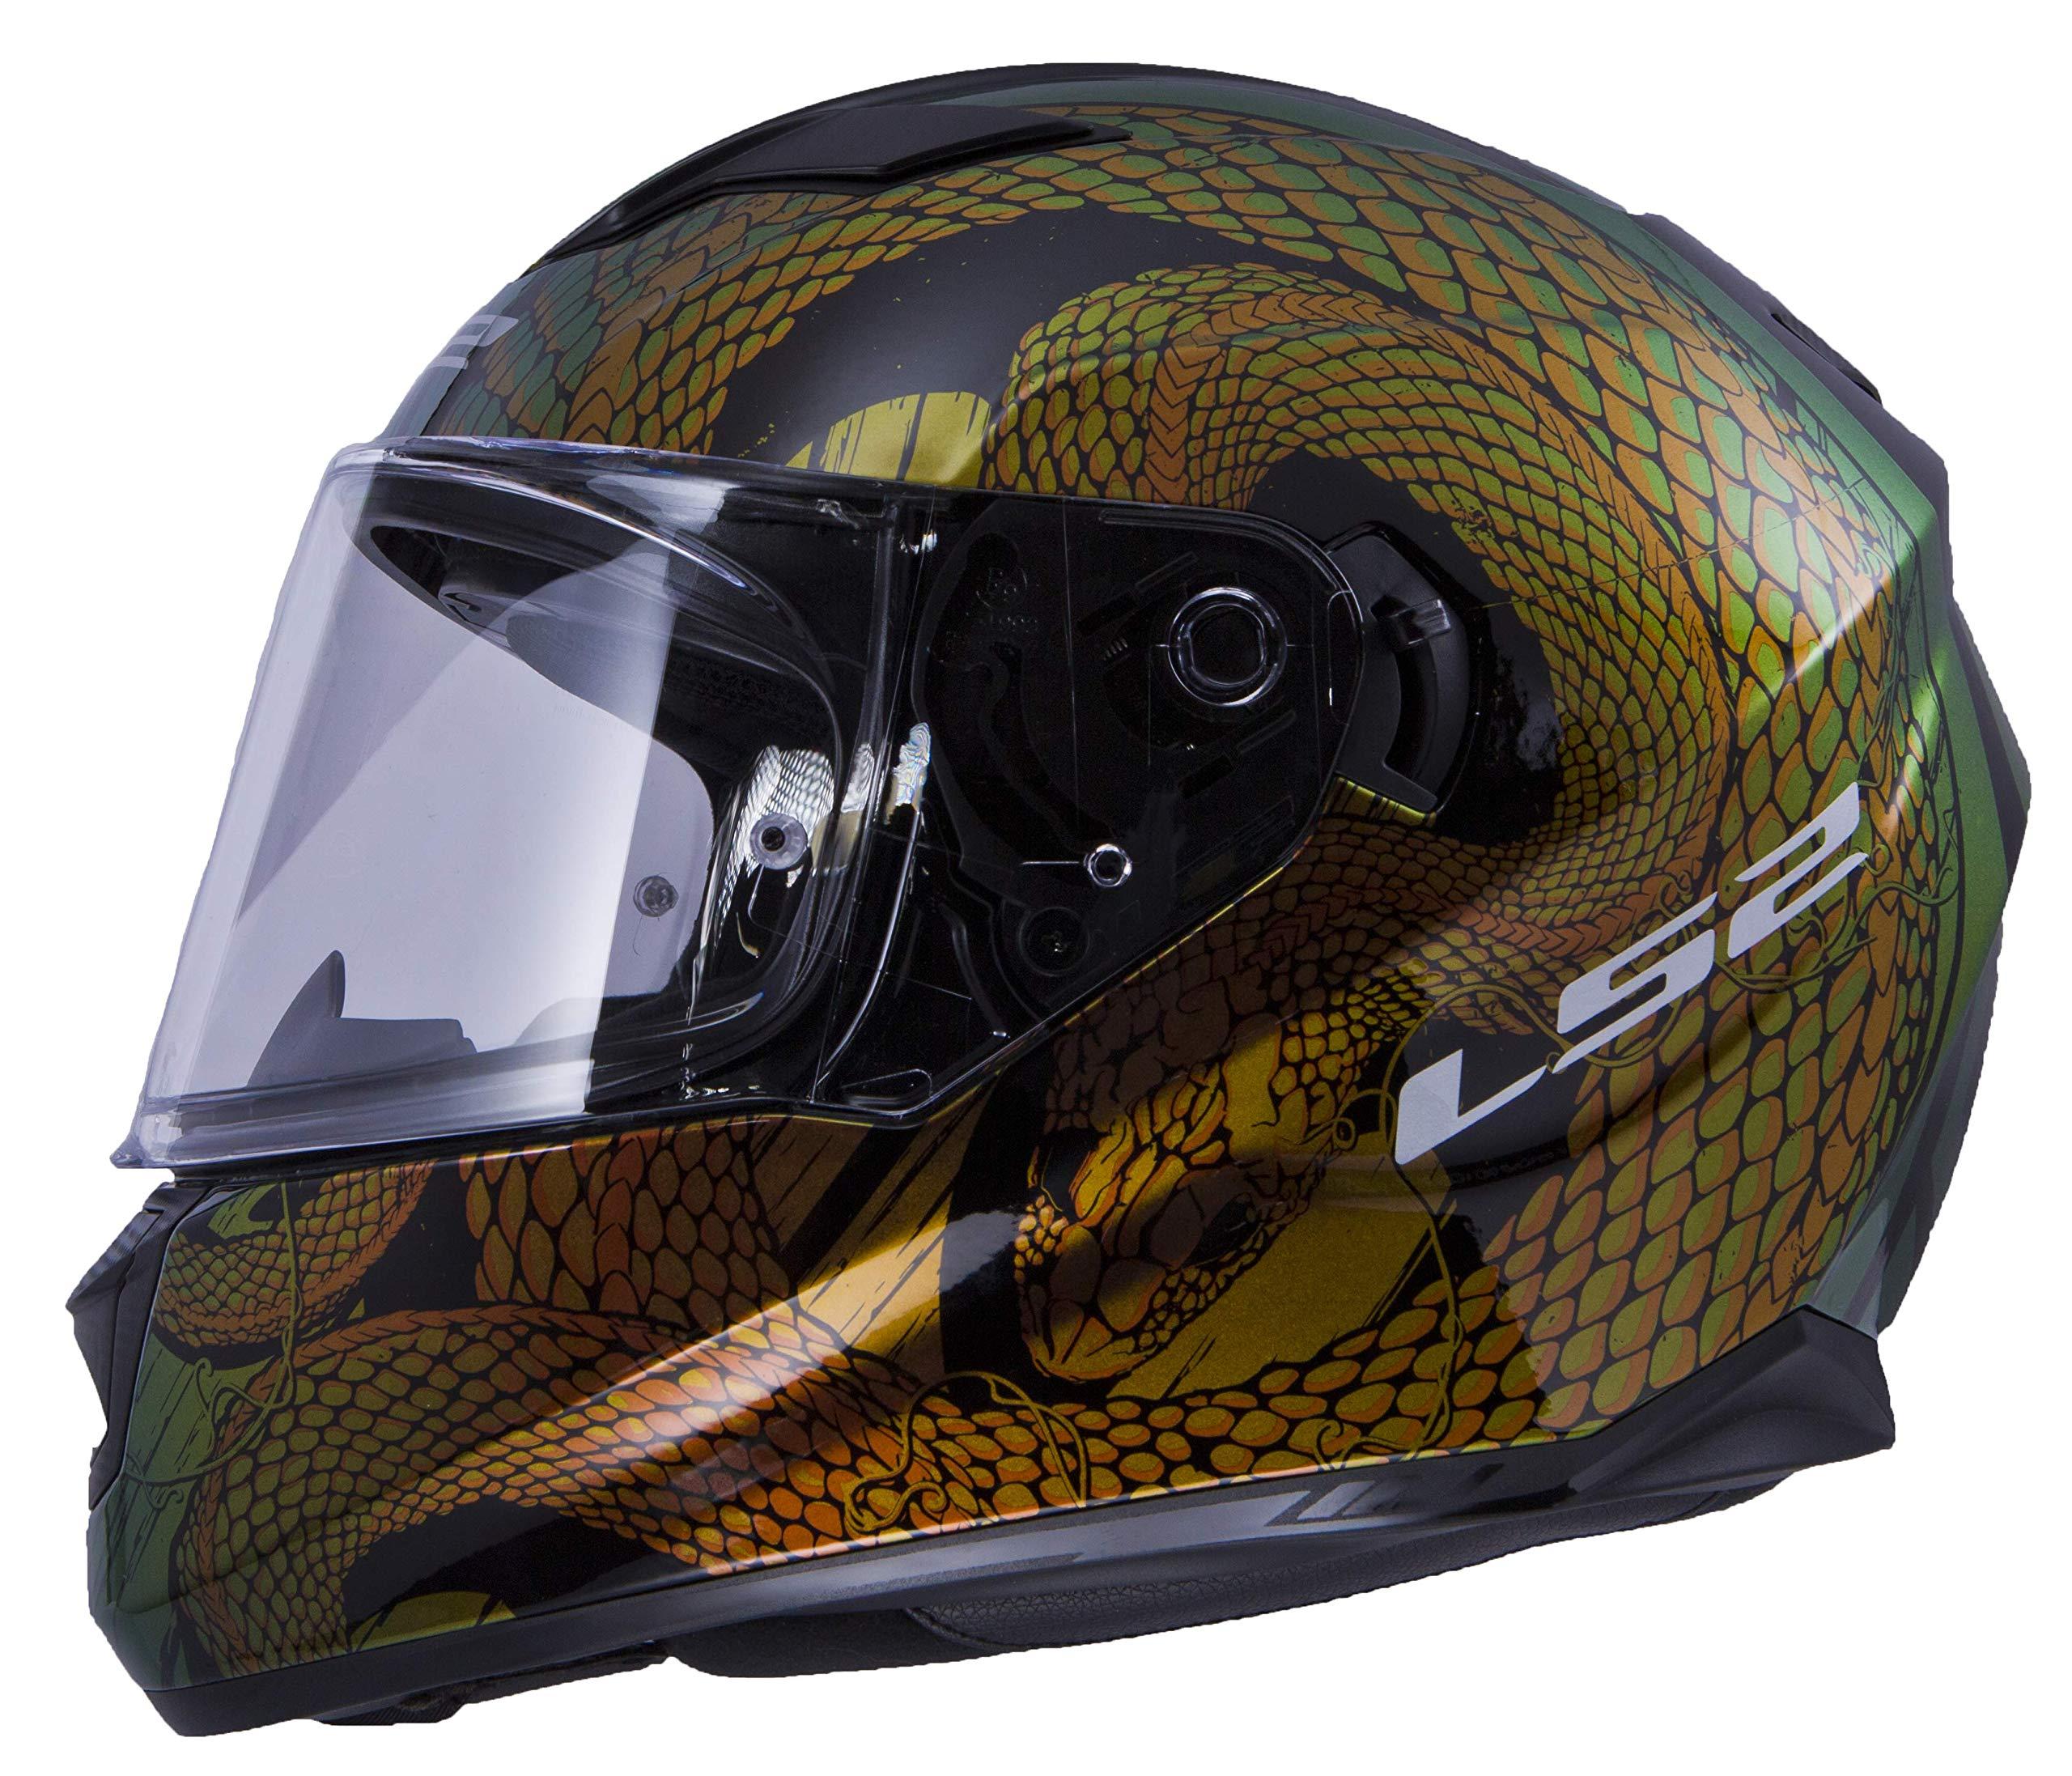 LS2 Helmets Unisex Adults Graphic Chameleon